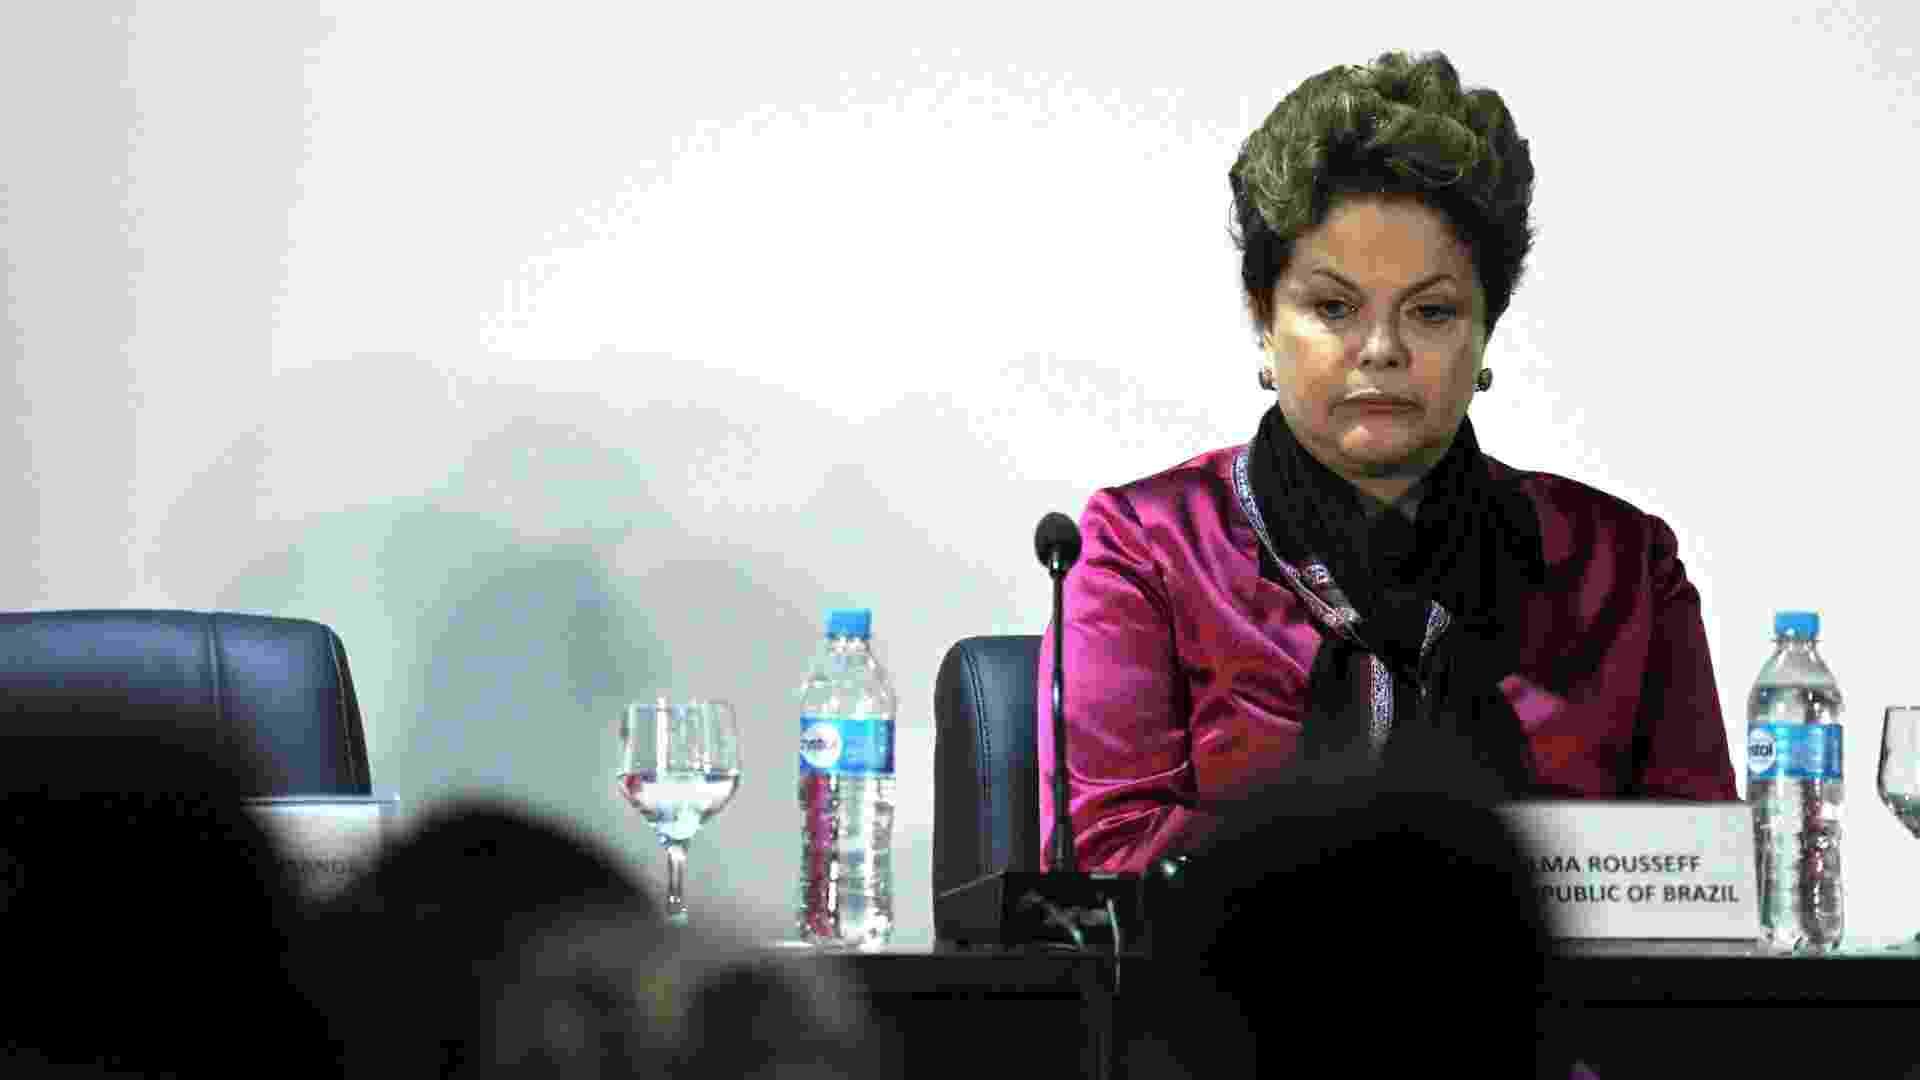 21.jun.2012 - Durante encontro de presidentes mulheres na Rio+20, a presidente Dilma Rousseff reclamou do ar condicionado do auditório - Júlio César Guimarães/UOL